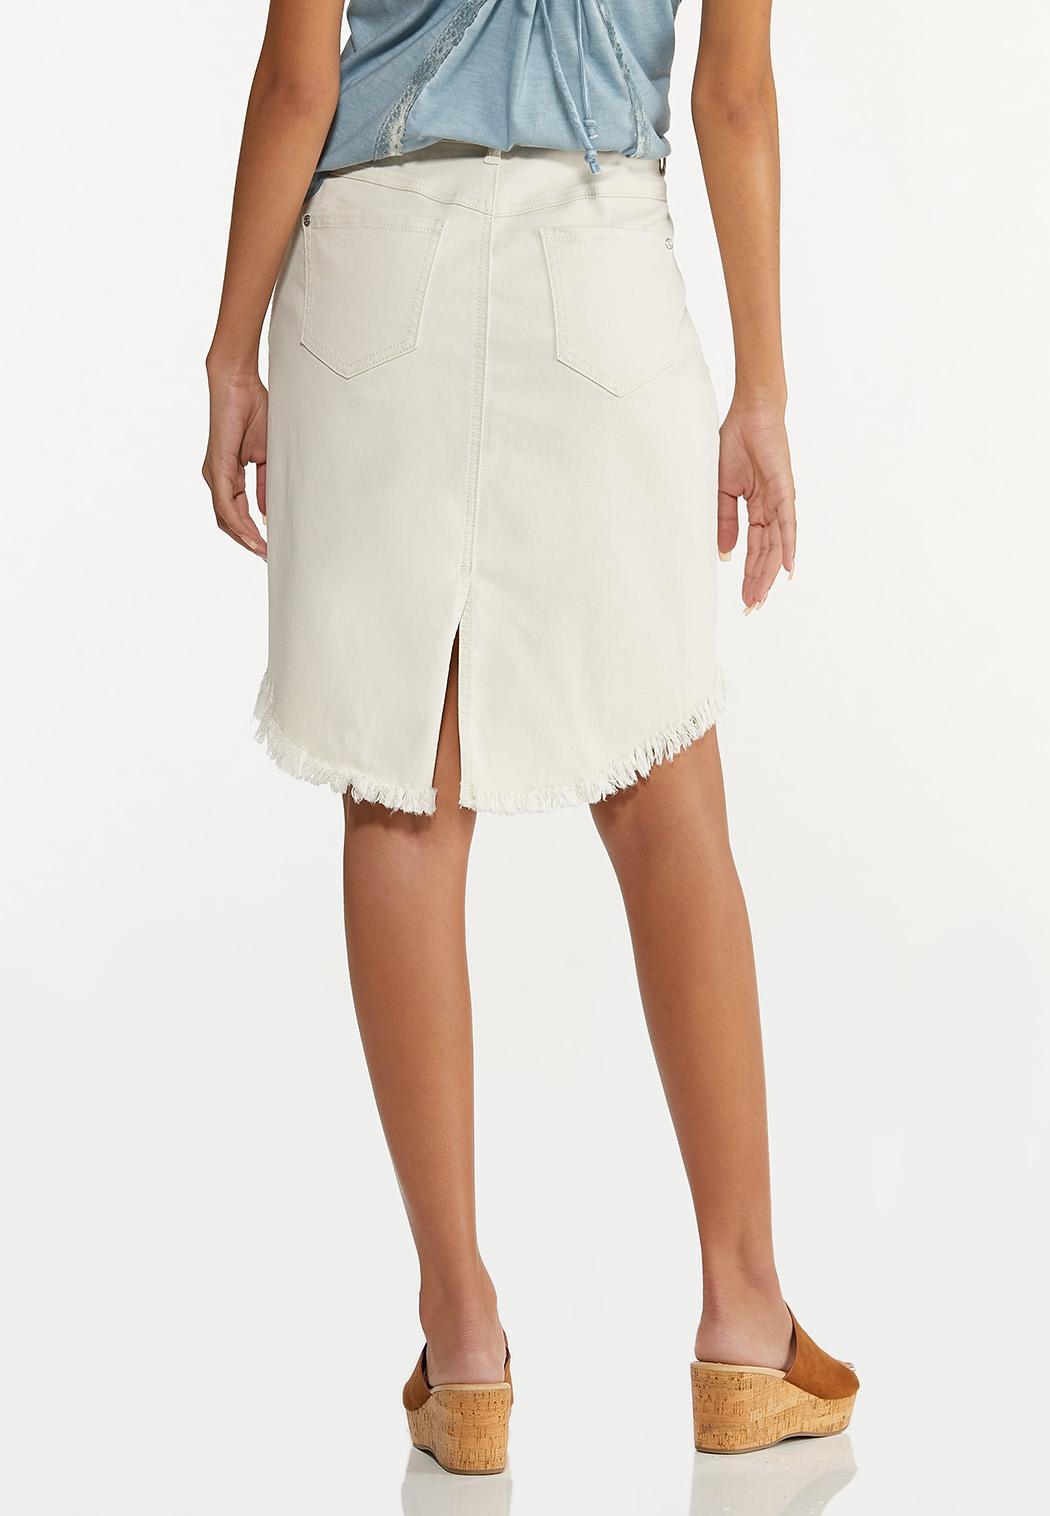 Plus Size Curved Frayed Denim Skirt (Item #44627530)